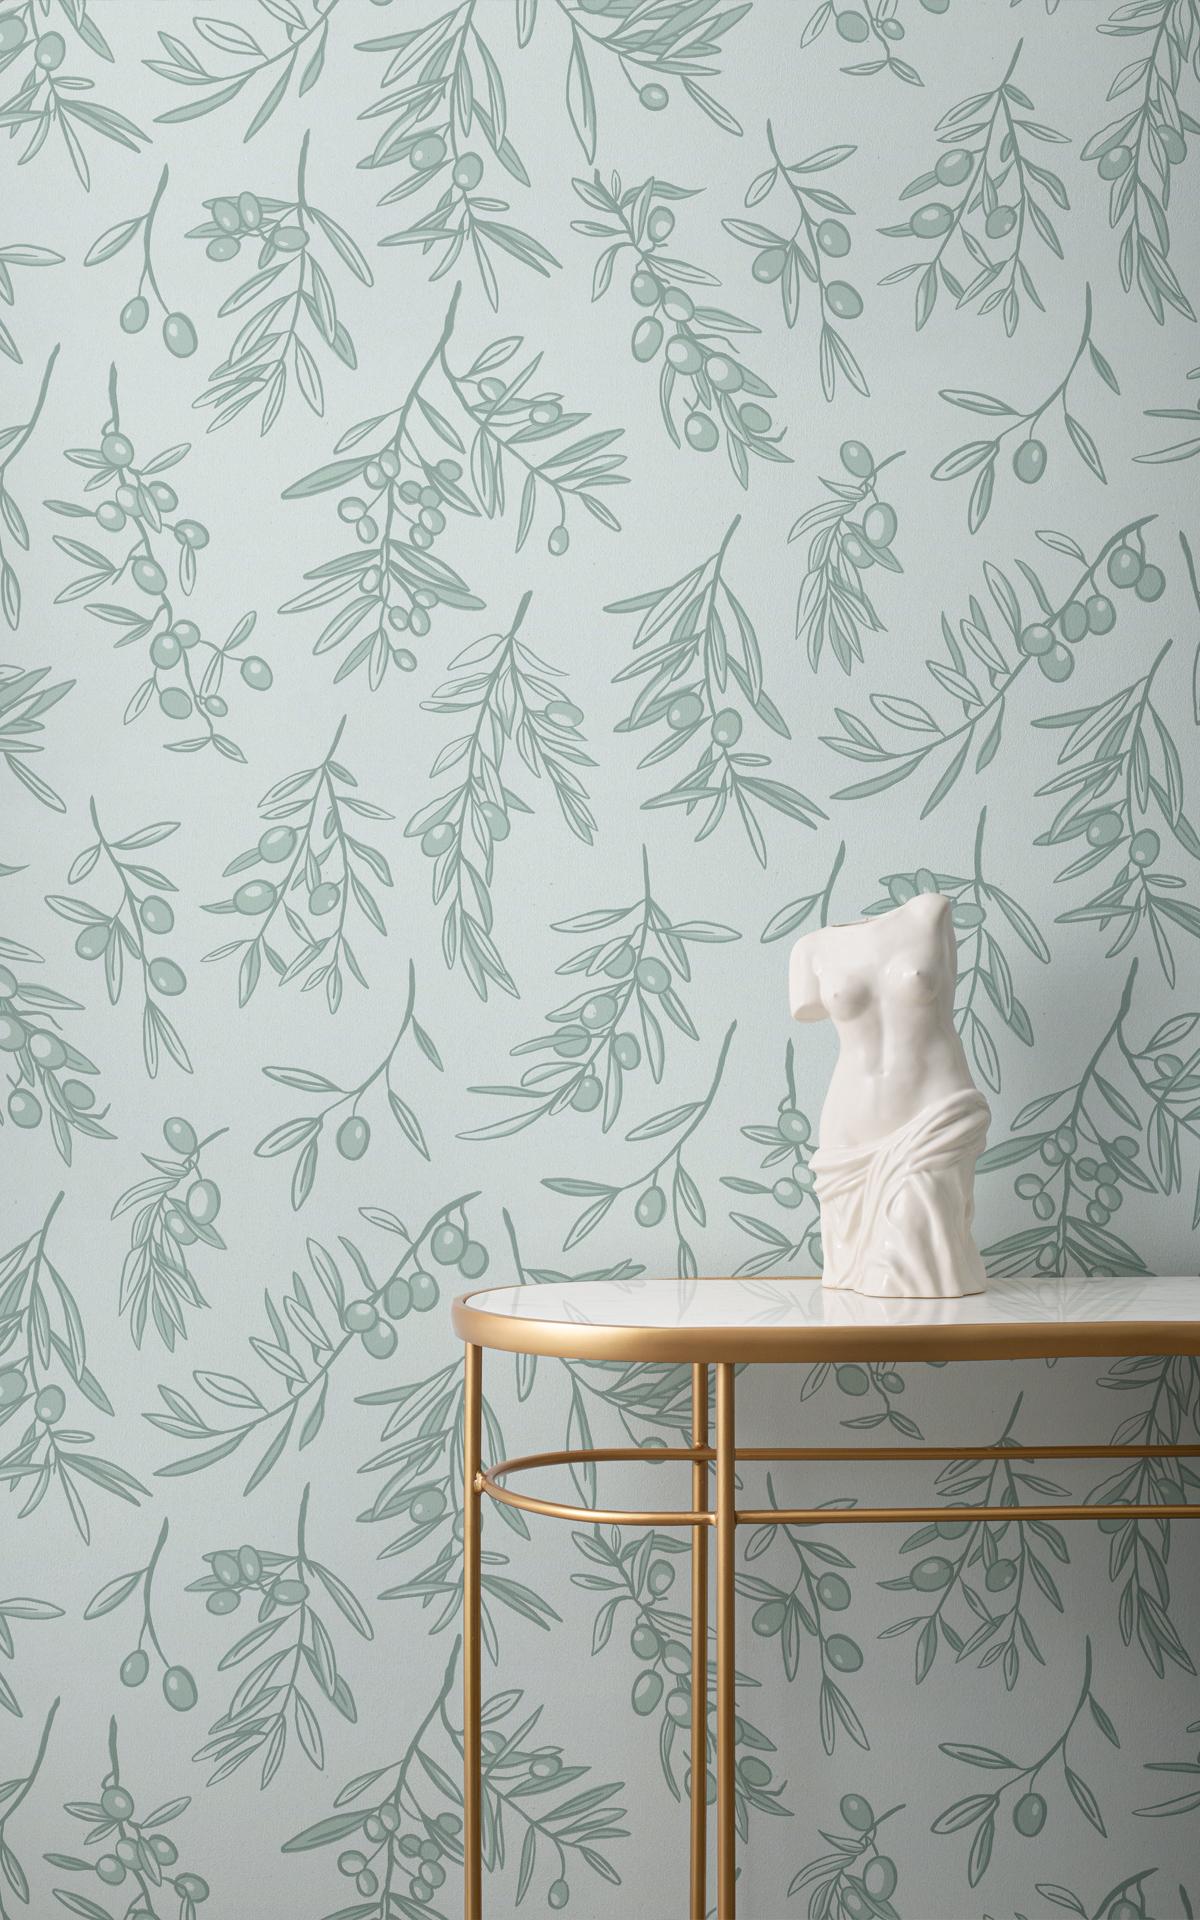 Kalamata Ancient Greece olive wallpaper mural in room setting